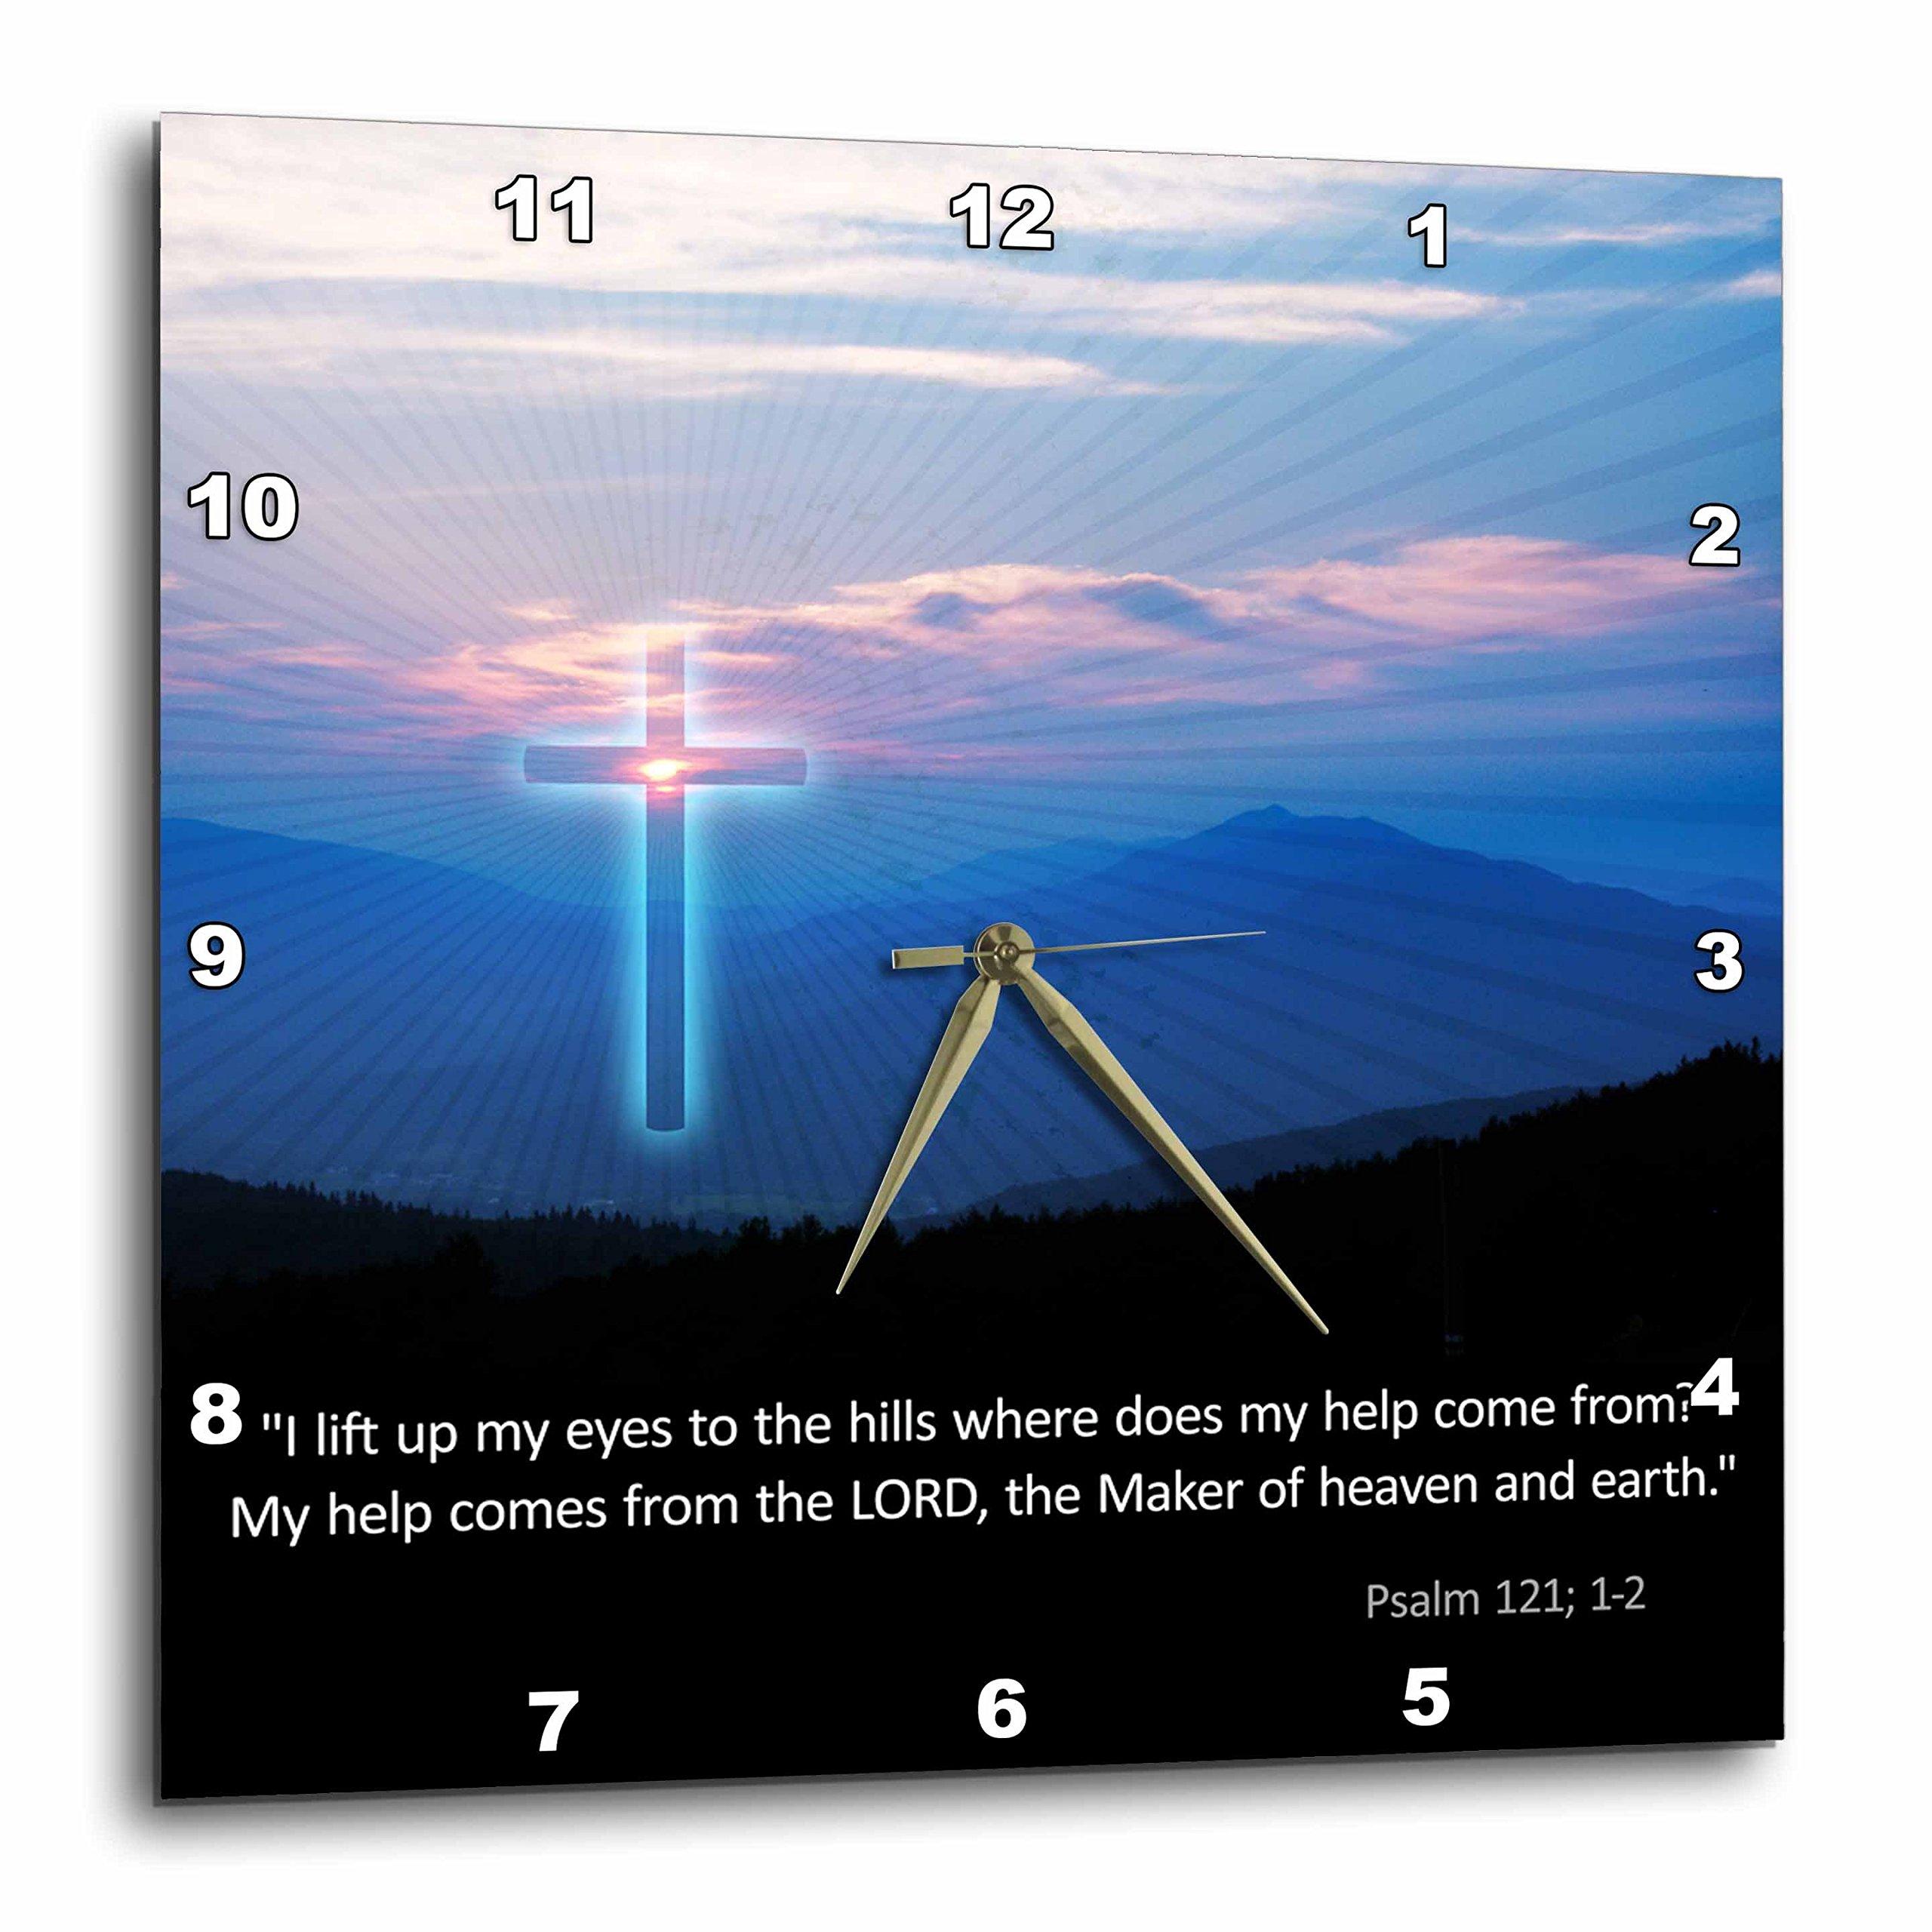 3dRose Christian - Inspirational Psalm - Wall Clock, 15 by 15-Inch (DPP_218867_3)